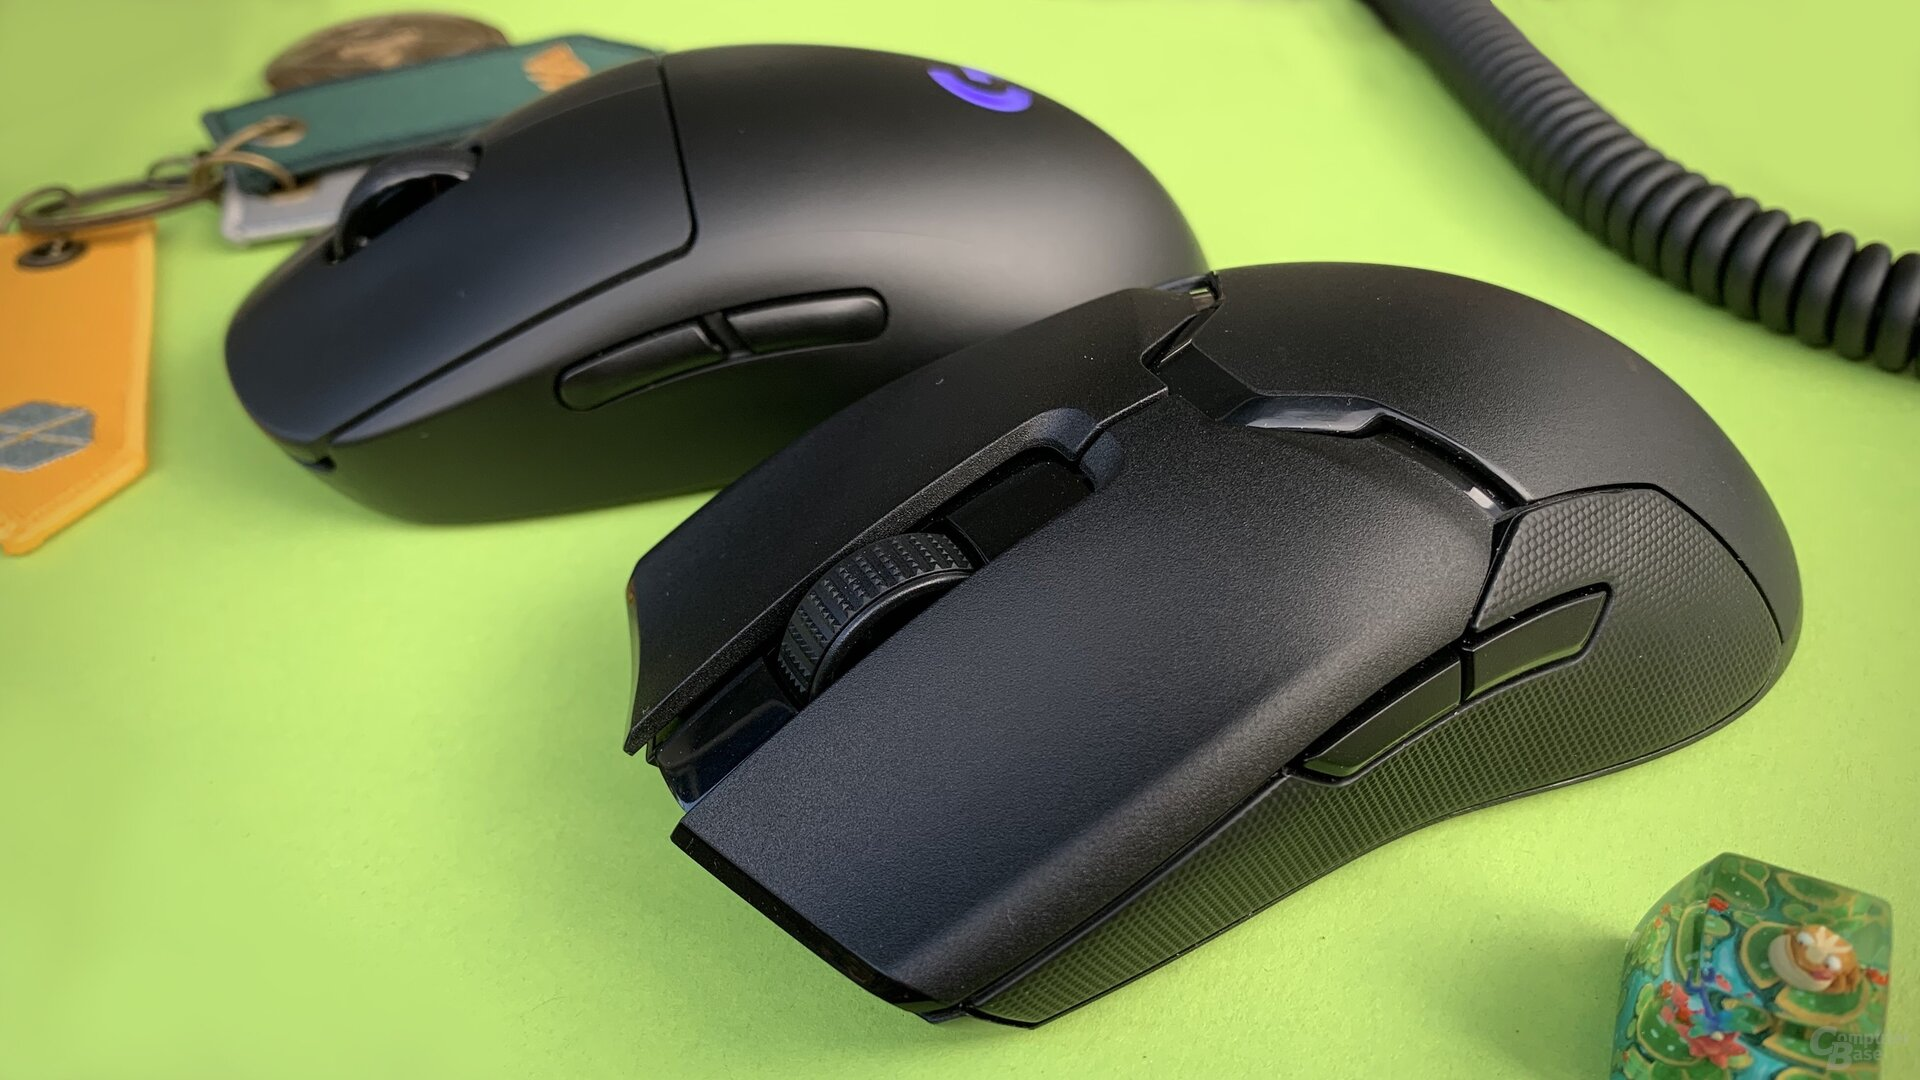 Razer Viper Ultimate & Logitech G Pro Wireless